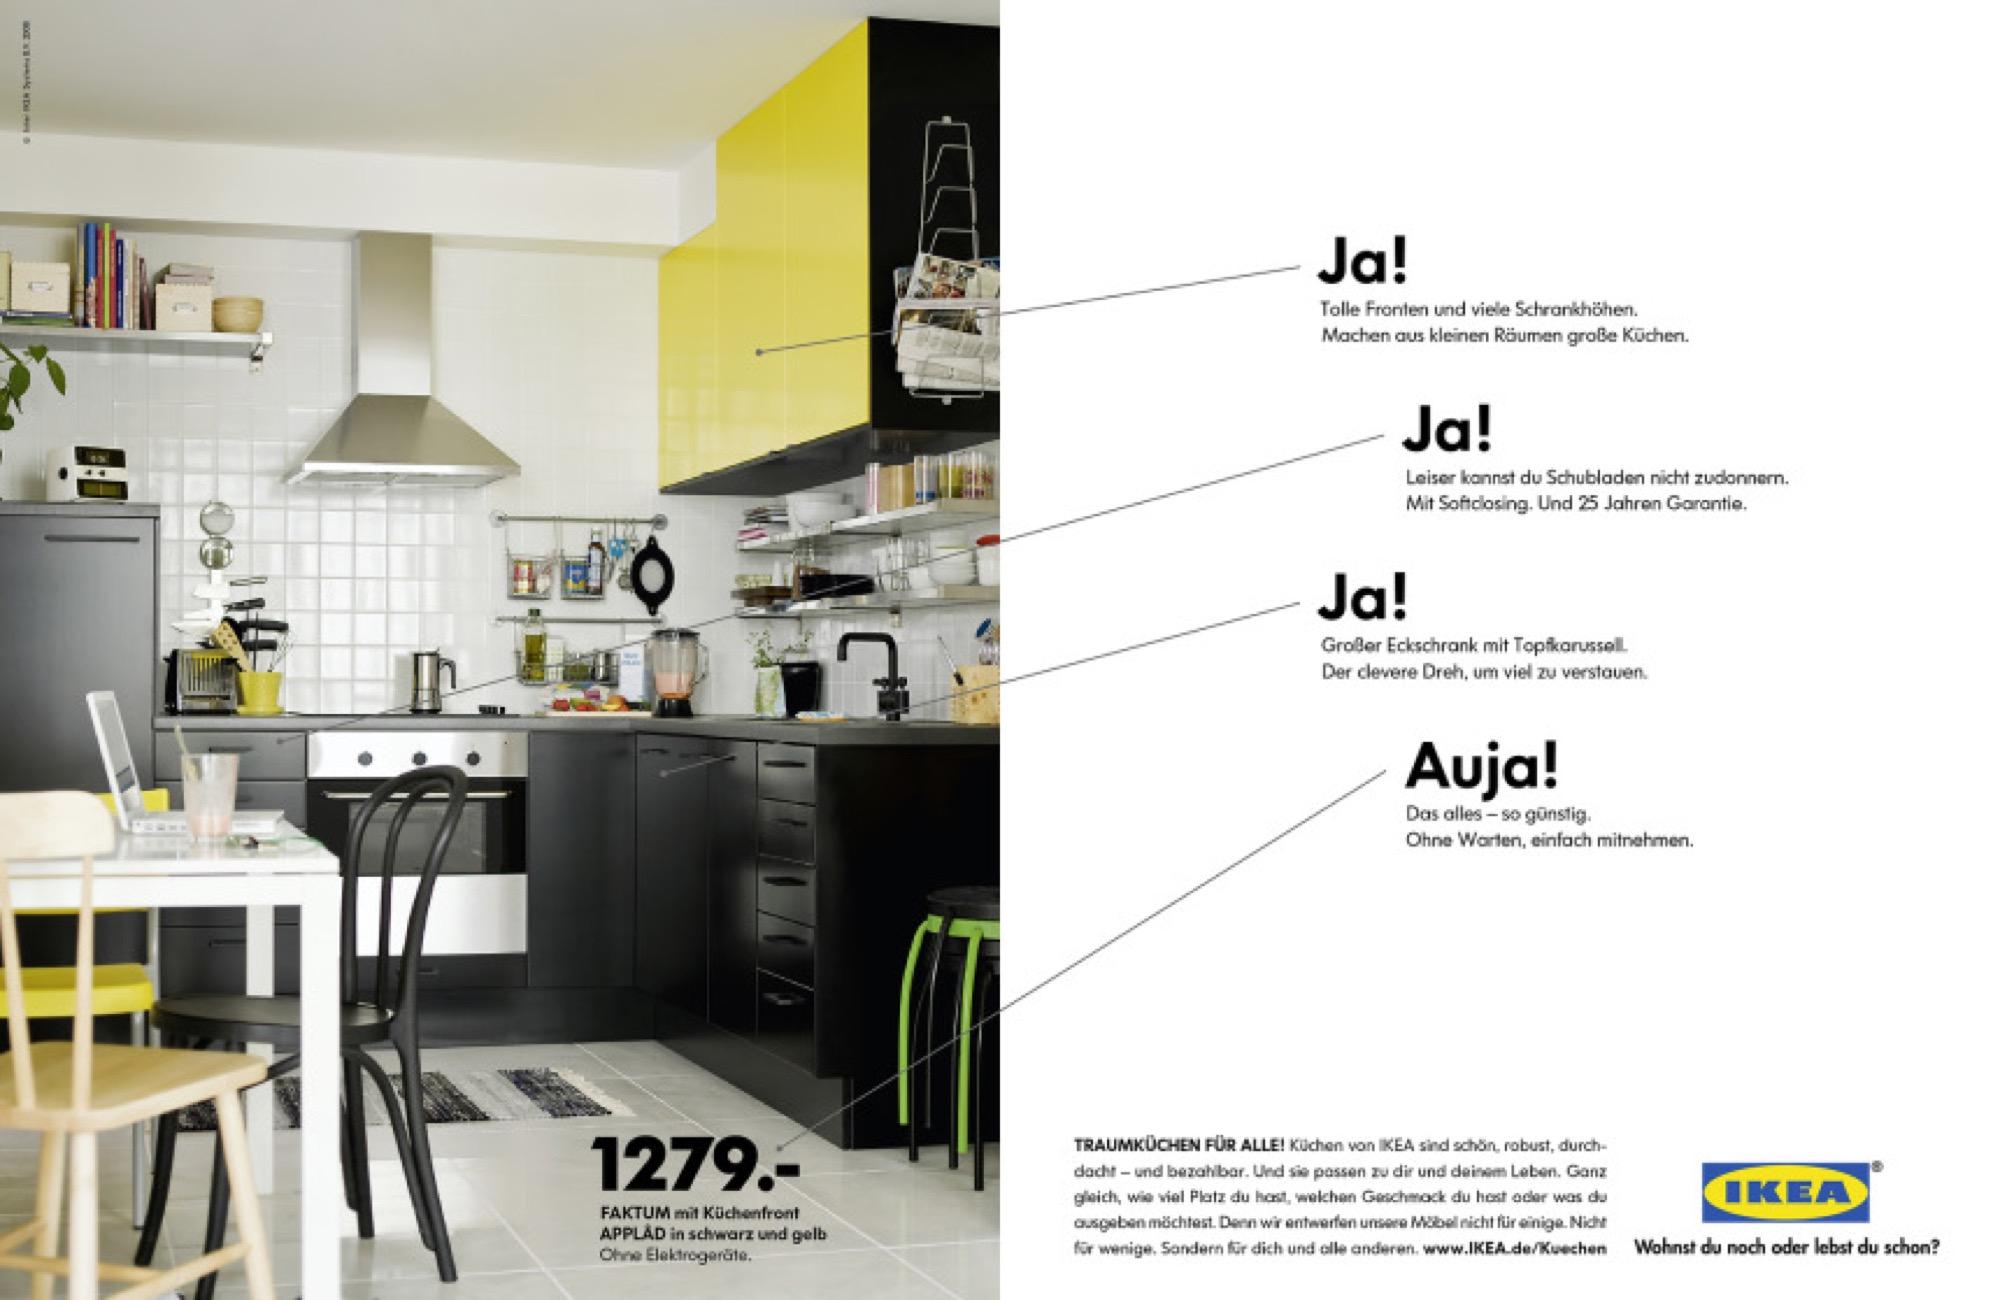 patric-johansson-143